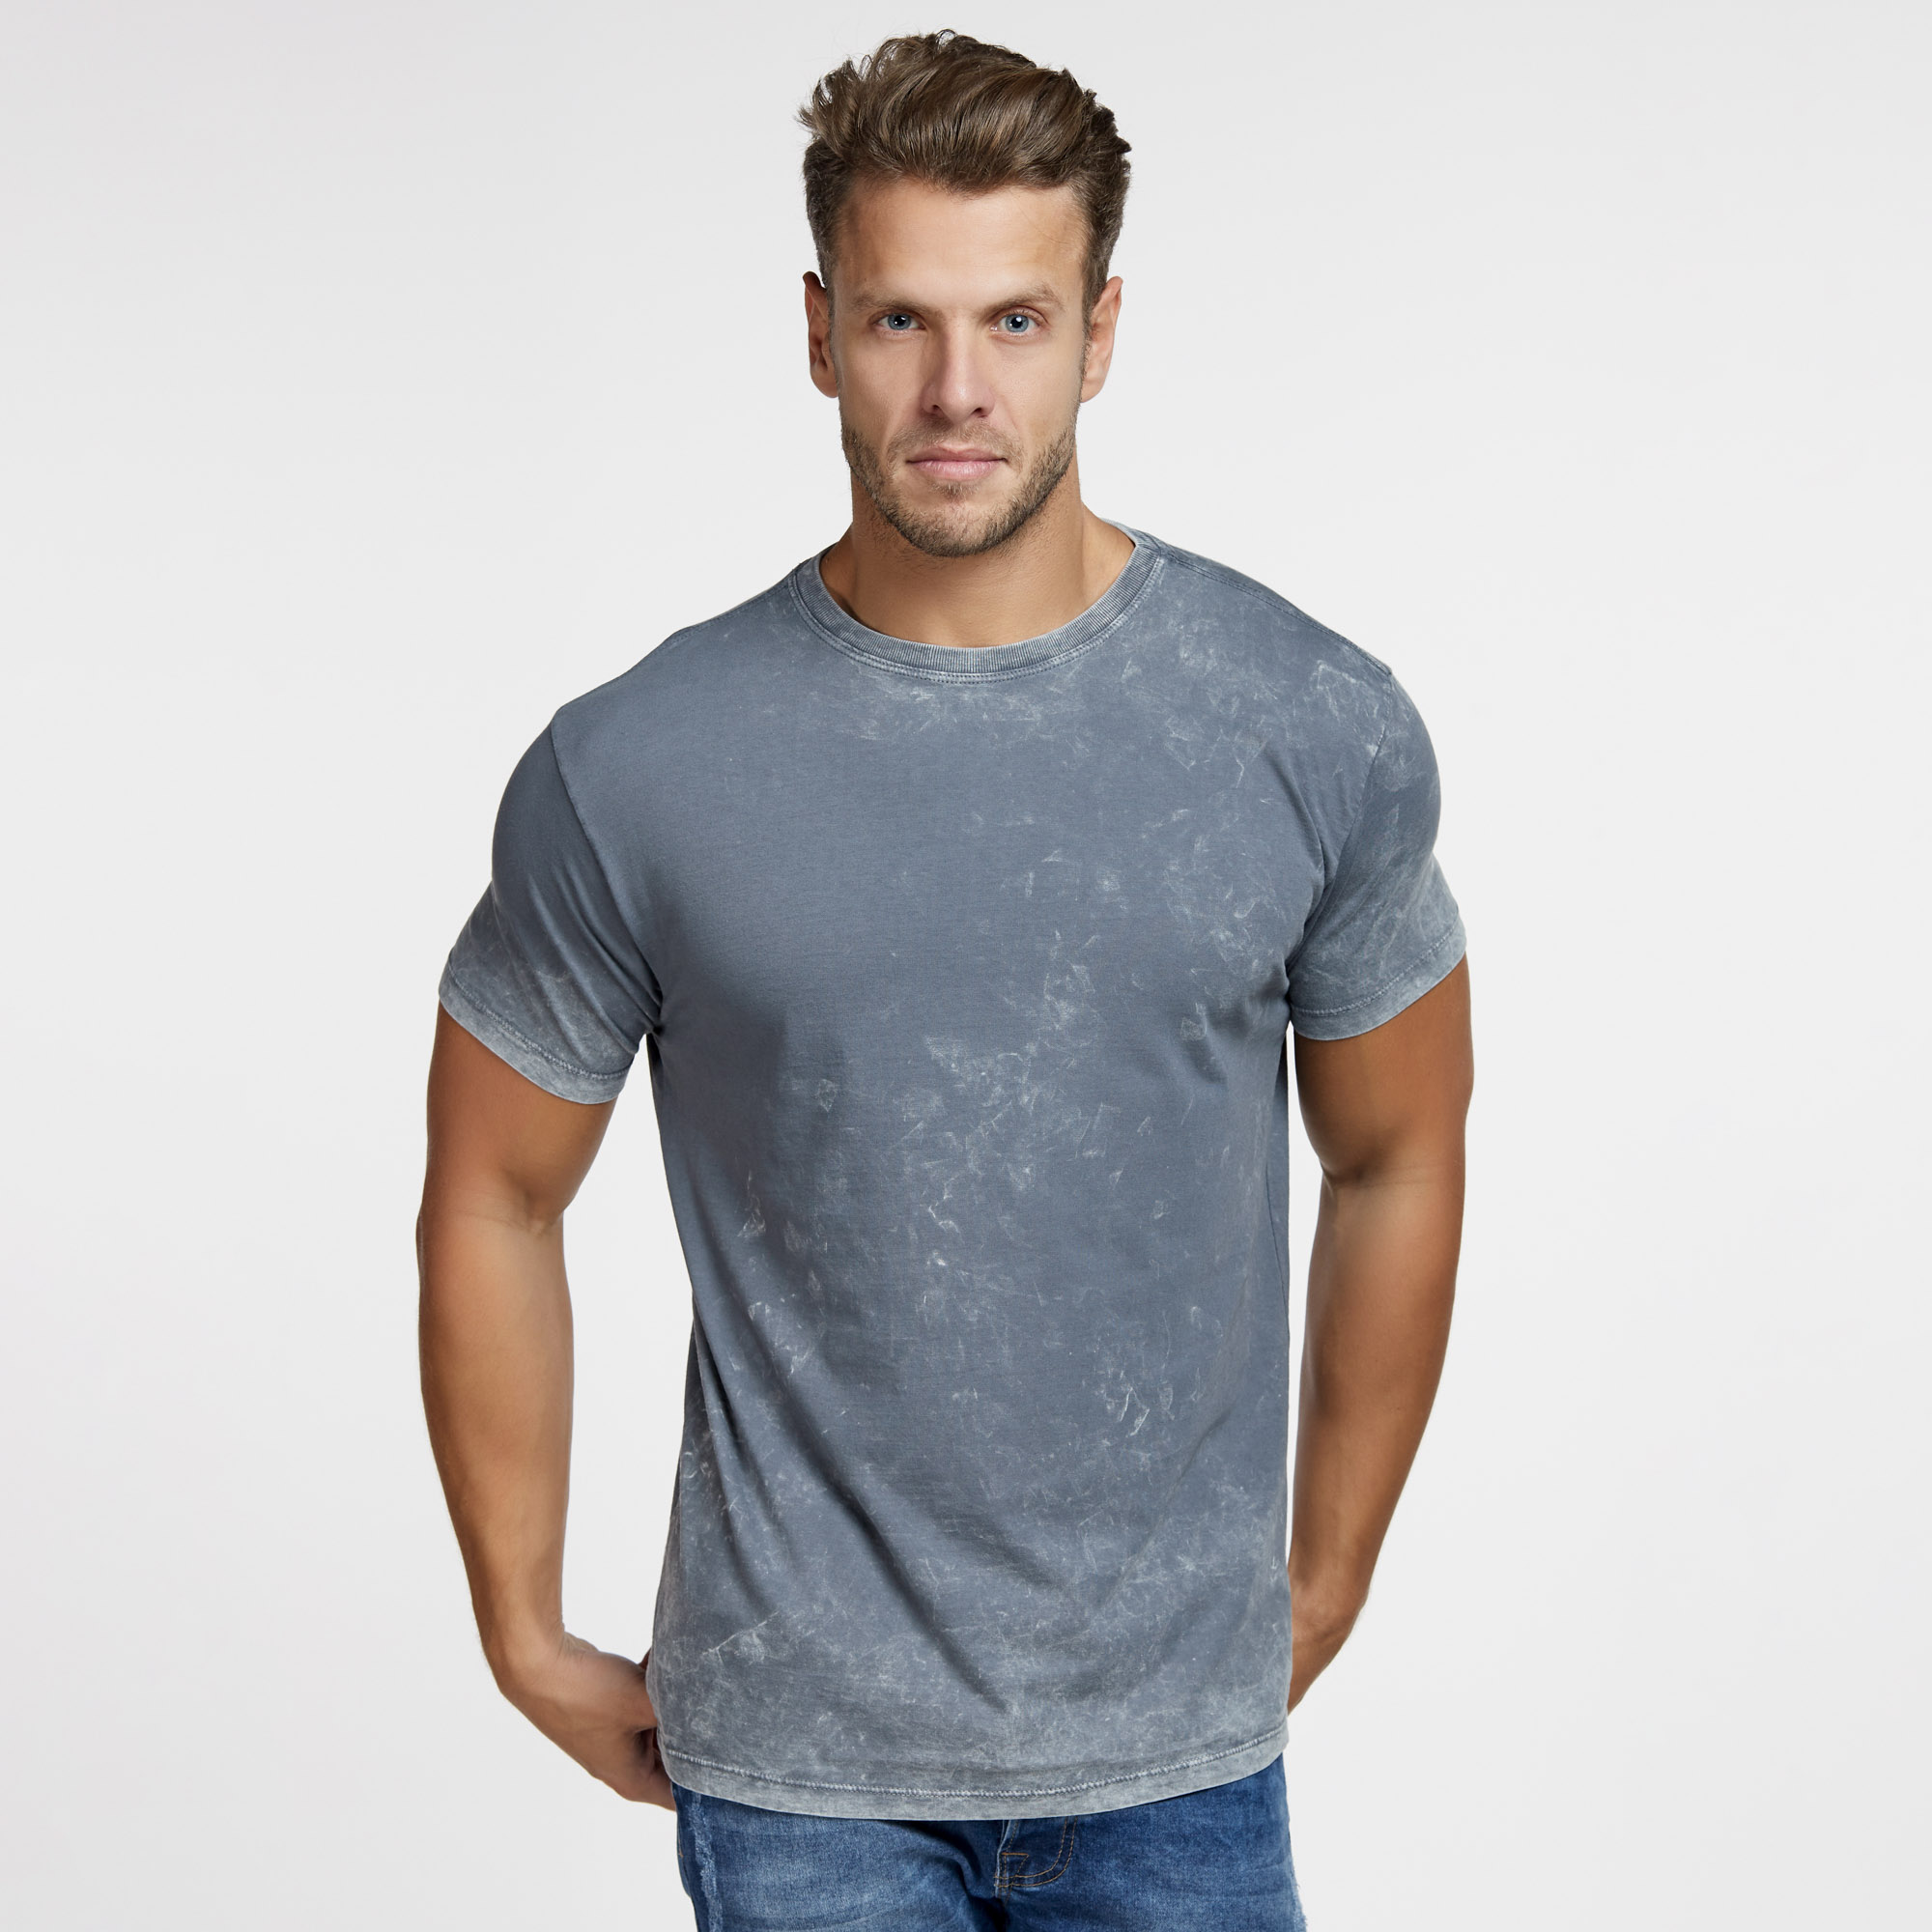 Camiseta Masculina Marmorizada do Avesso Cinza